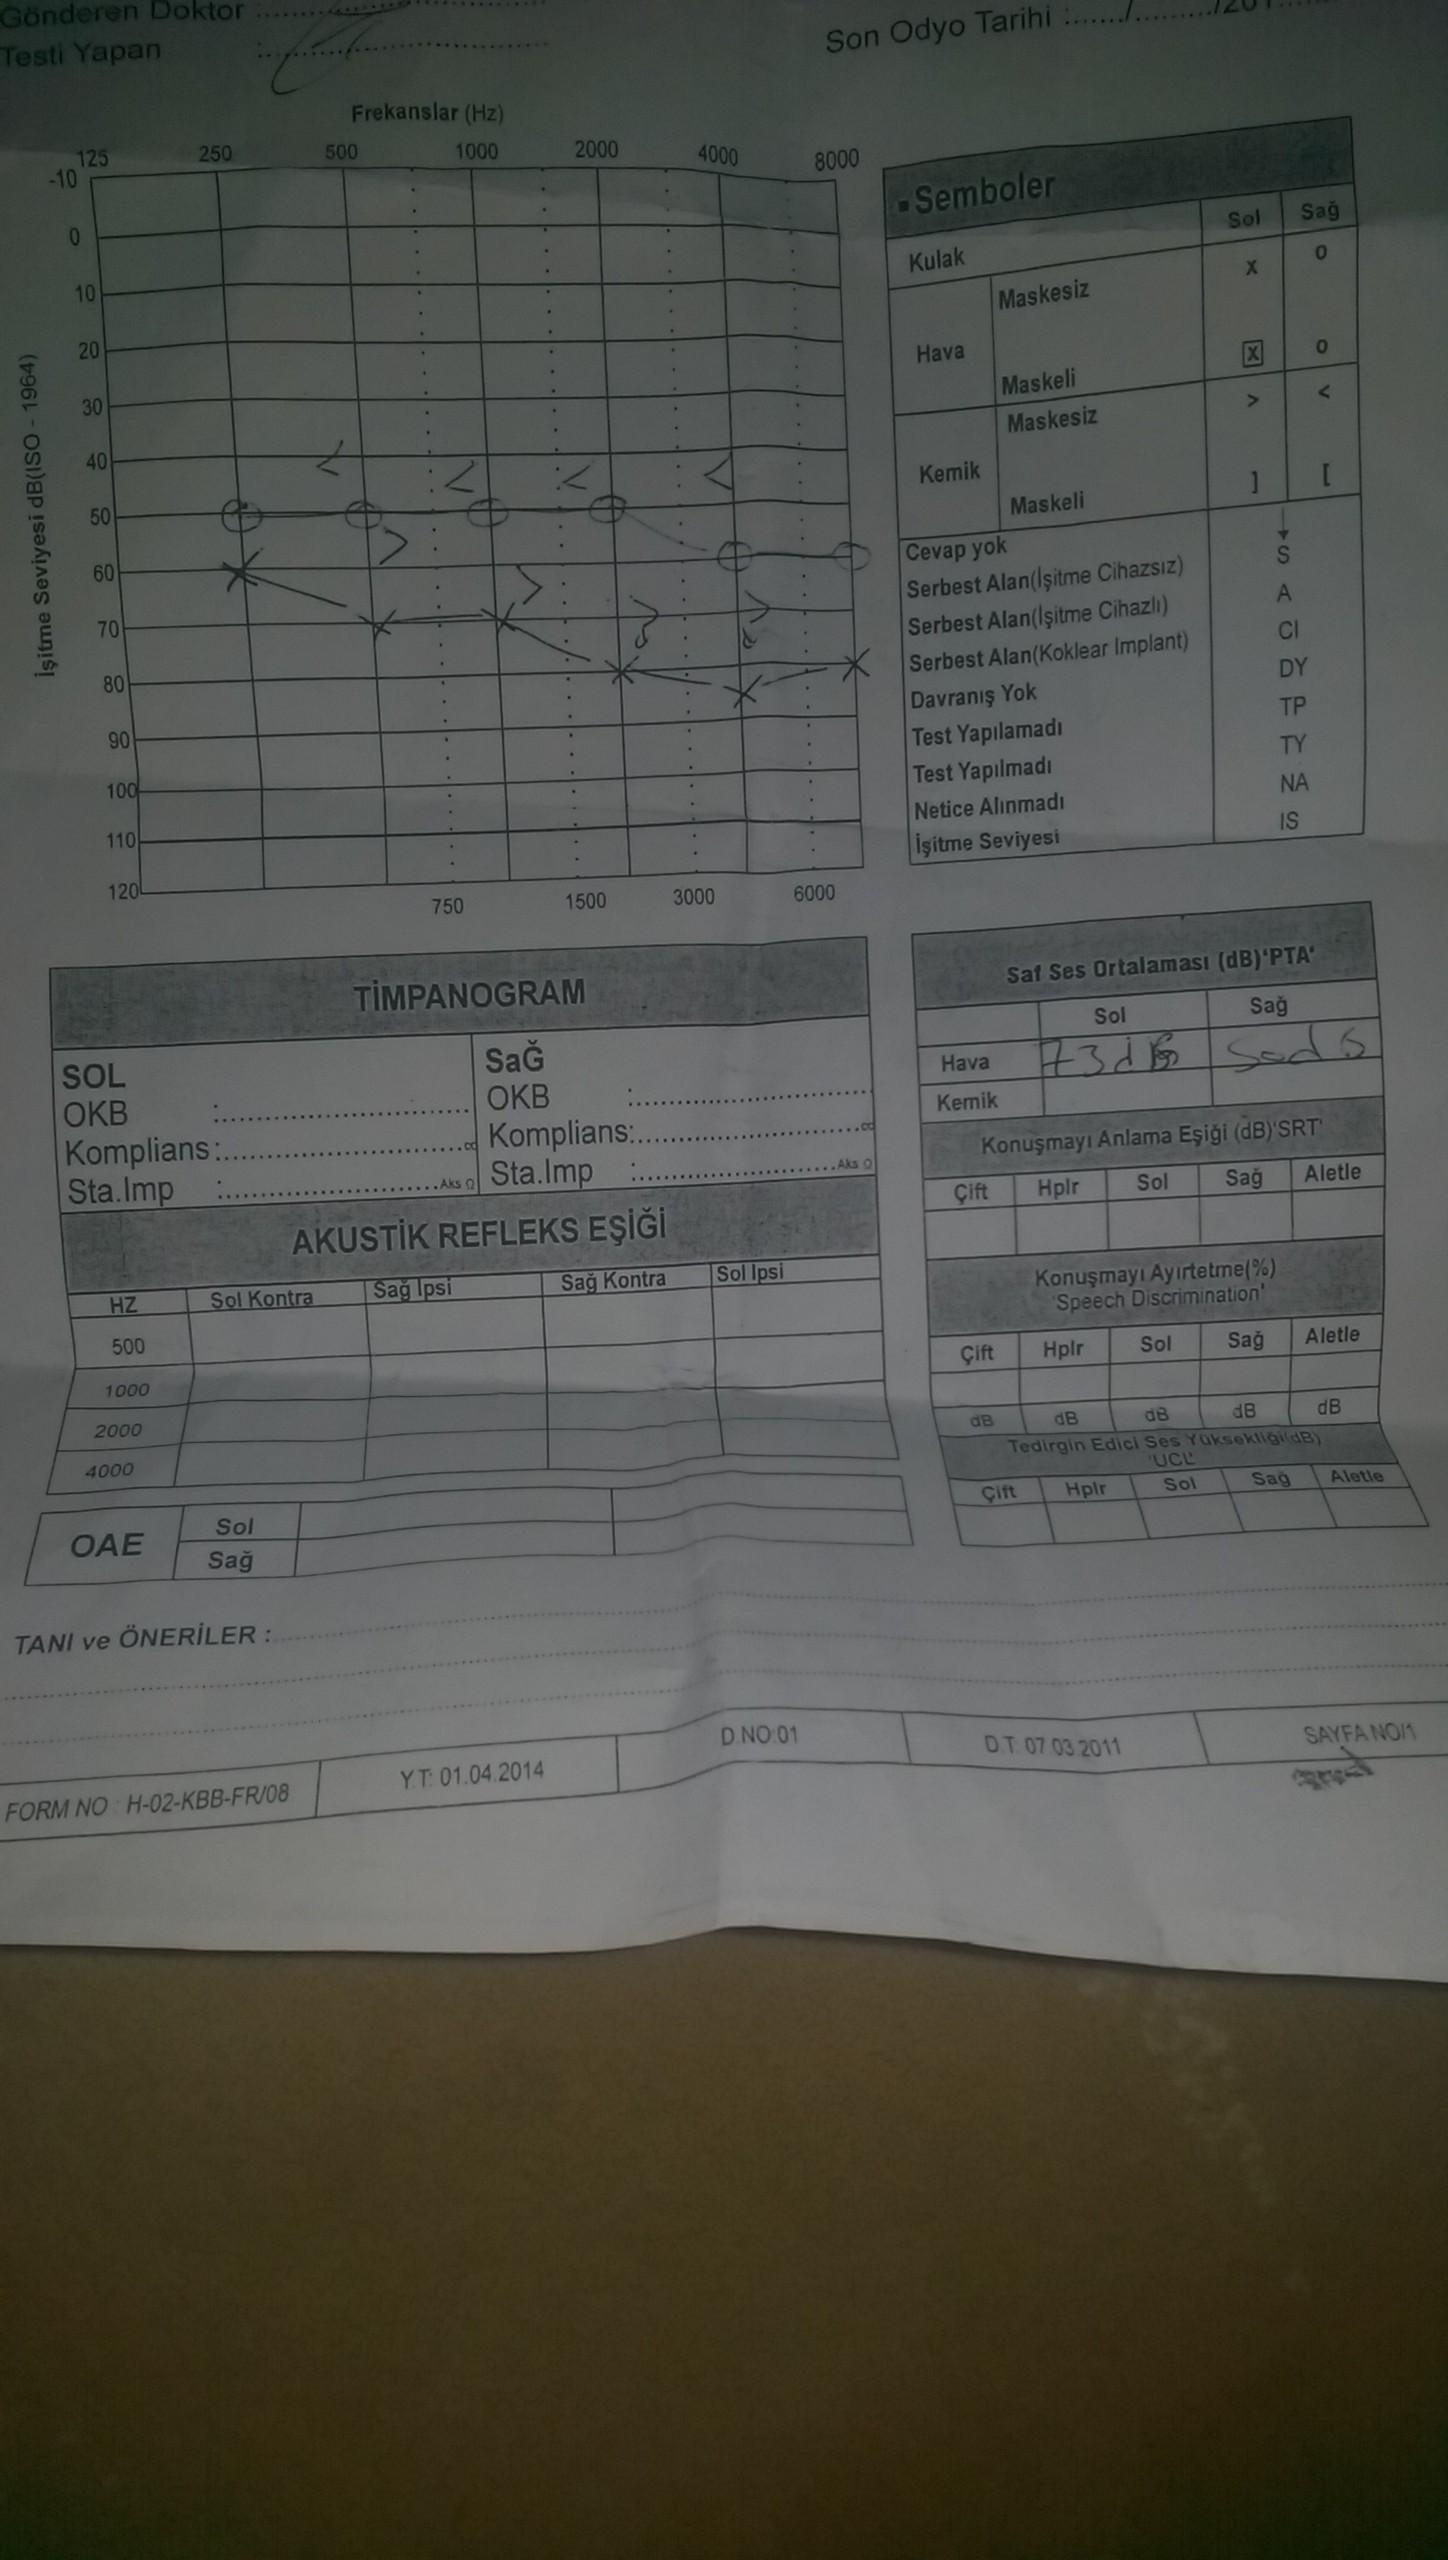 QZ14b3 - ��itme testinden �z�r oran� hesaplanmas�